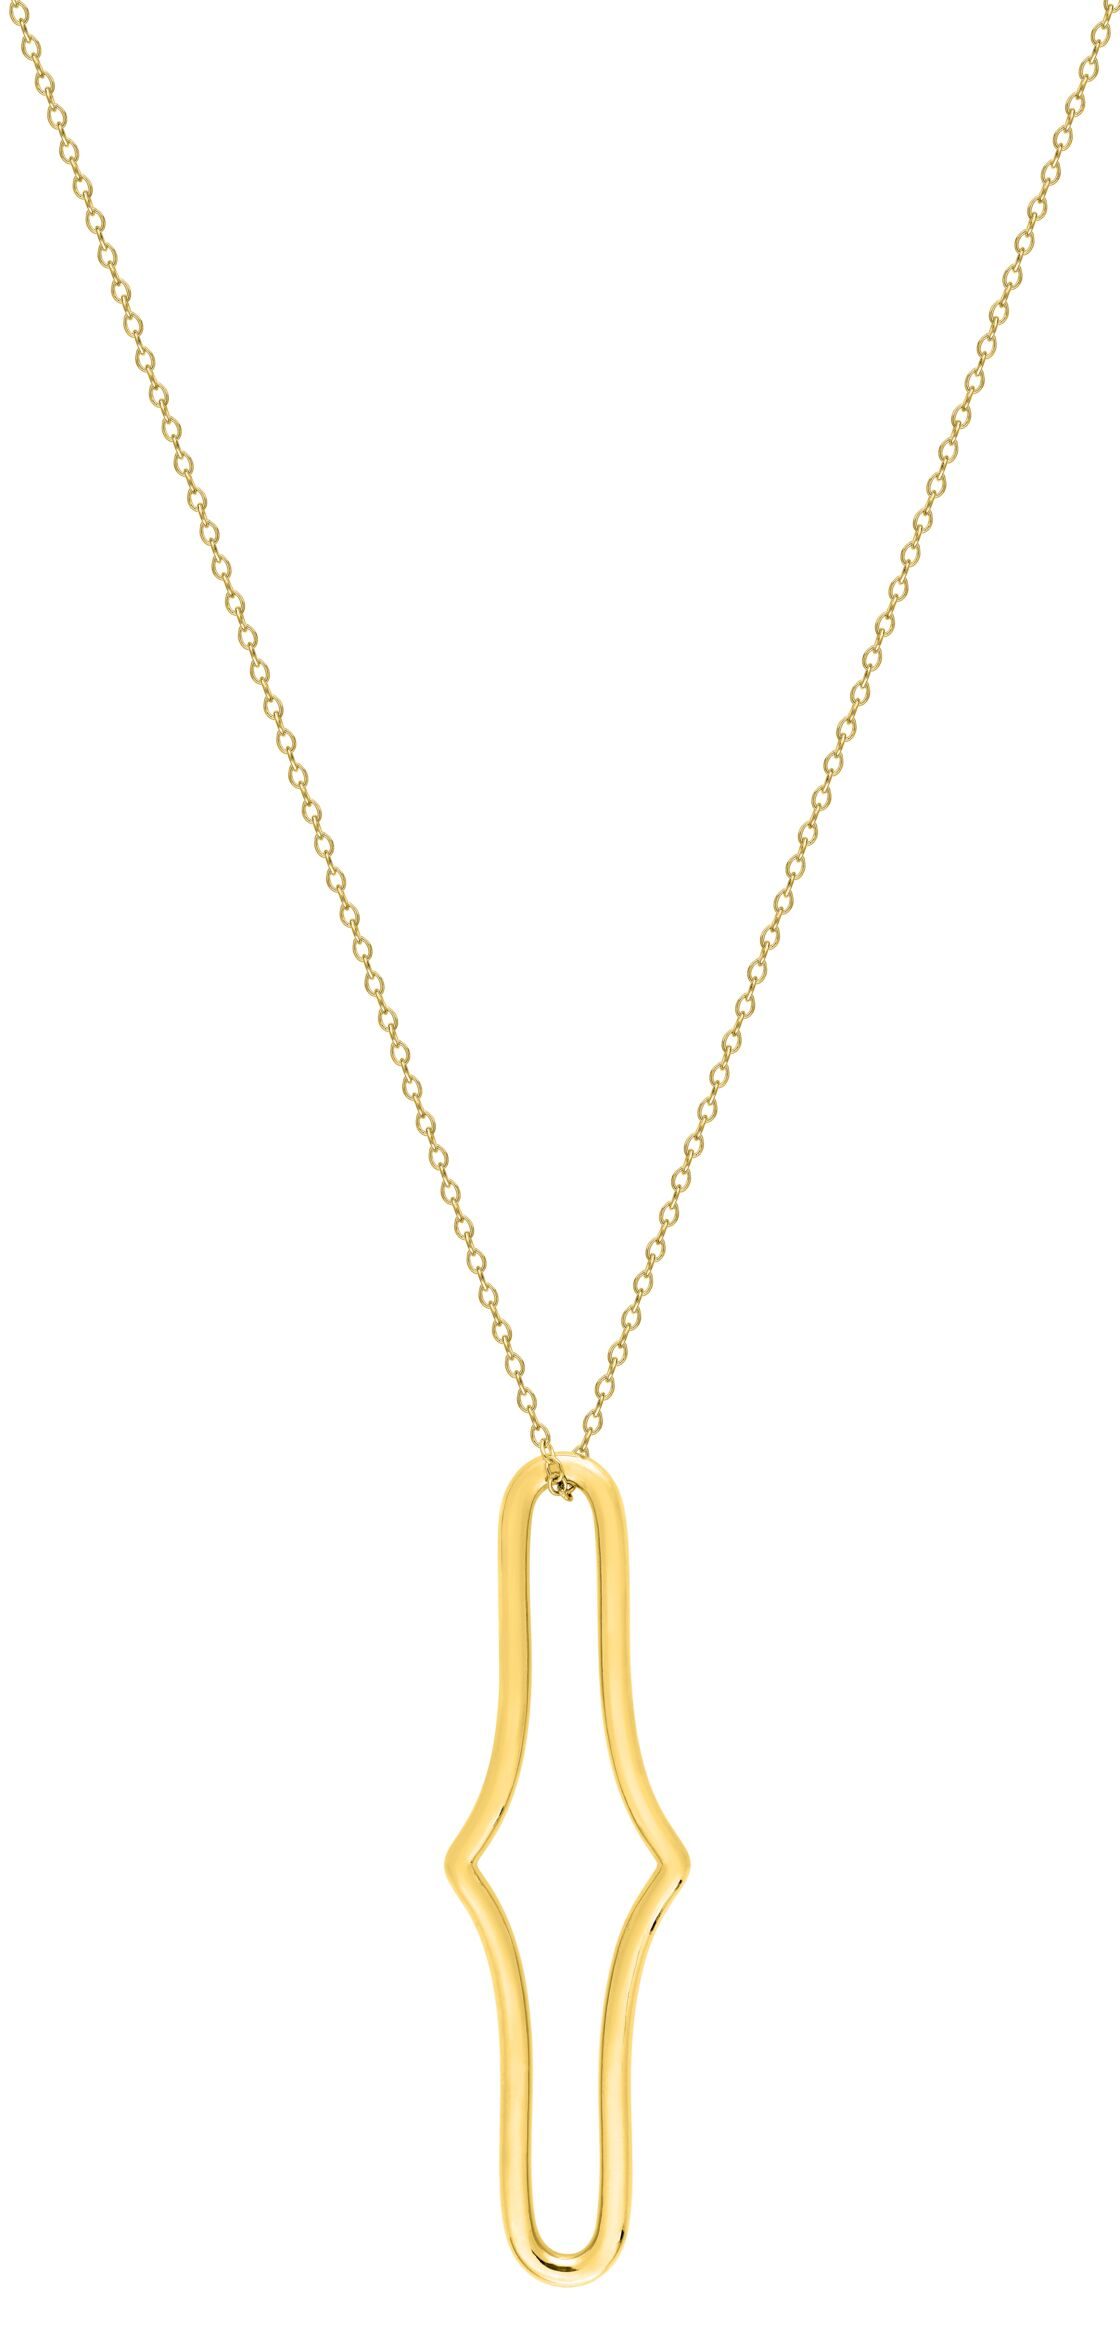 Collier Glamour en plaqué or